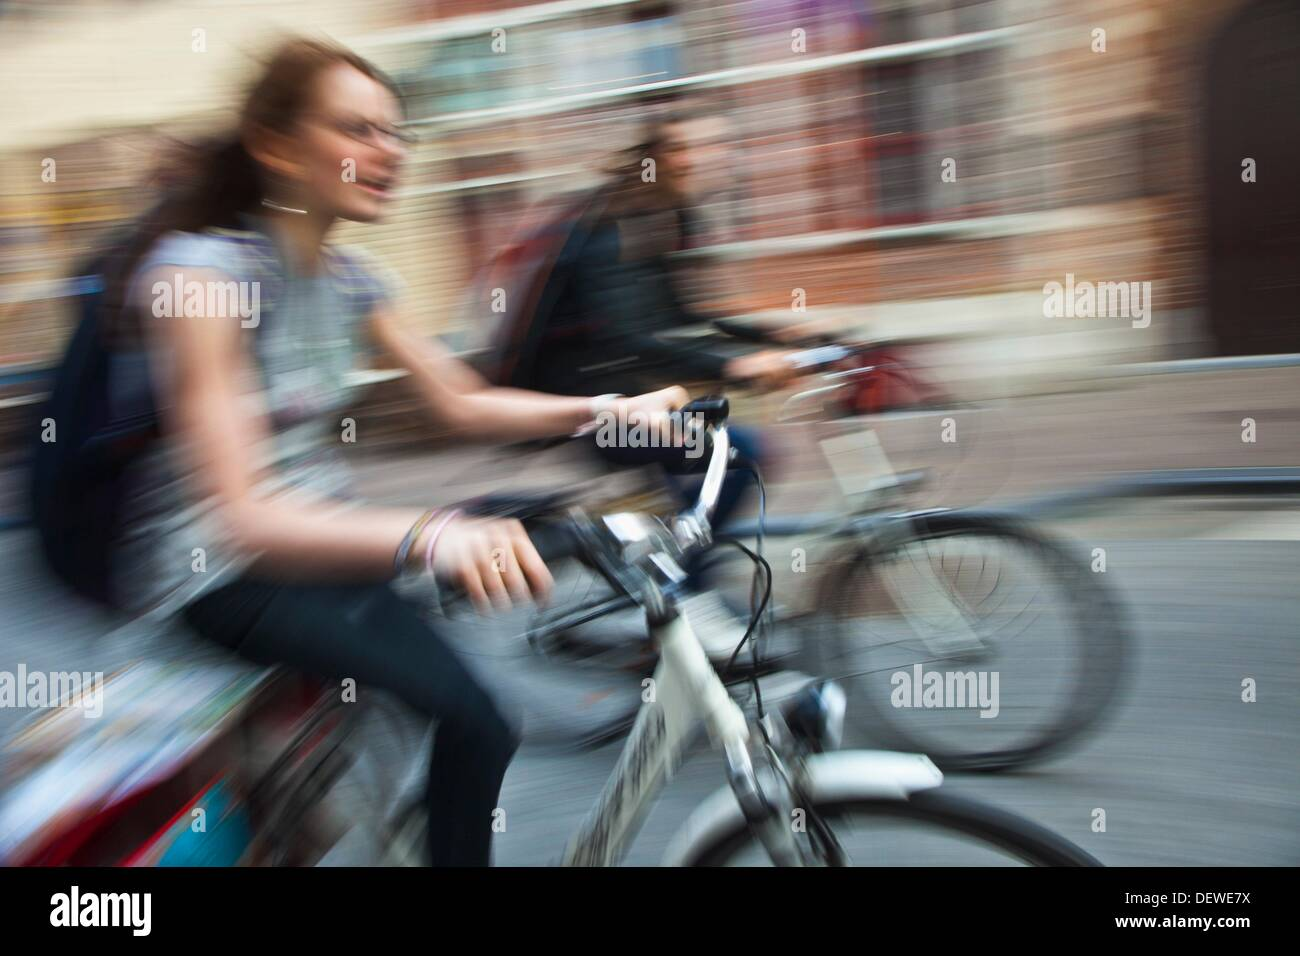 People in cycle  Bruges, Brugge, Flanders,Belgium, UNESCO World Heritage Site. - Stock Image